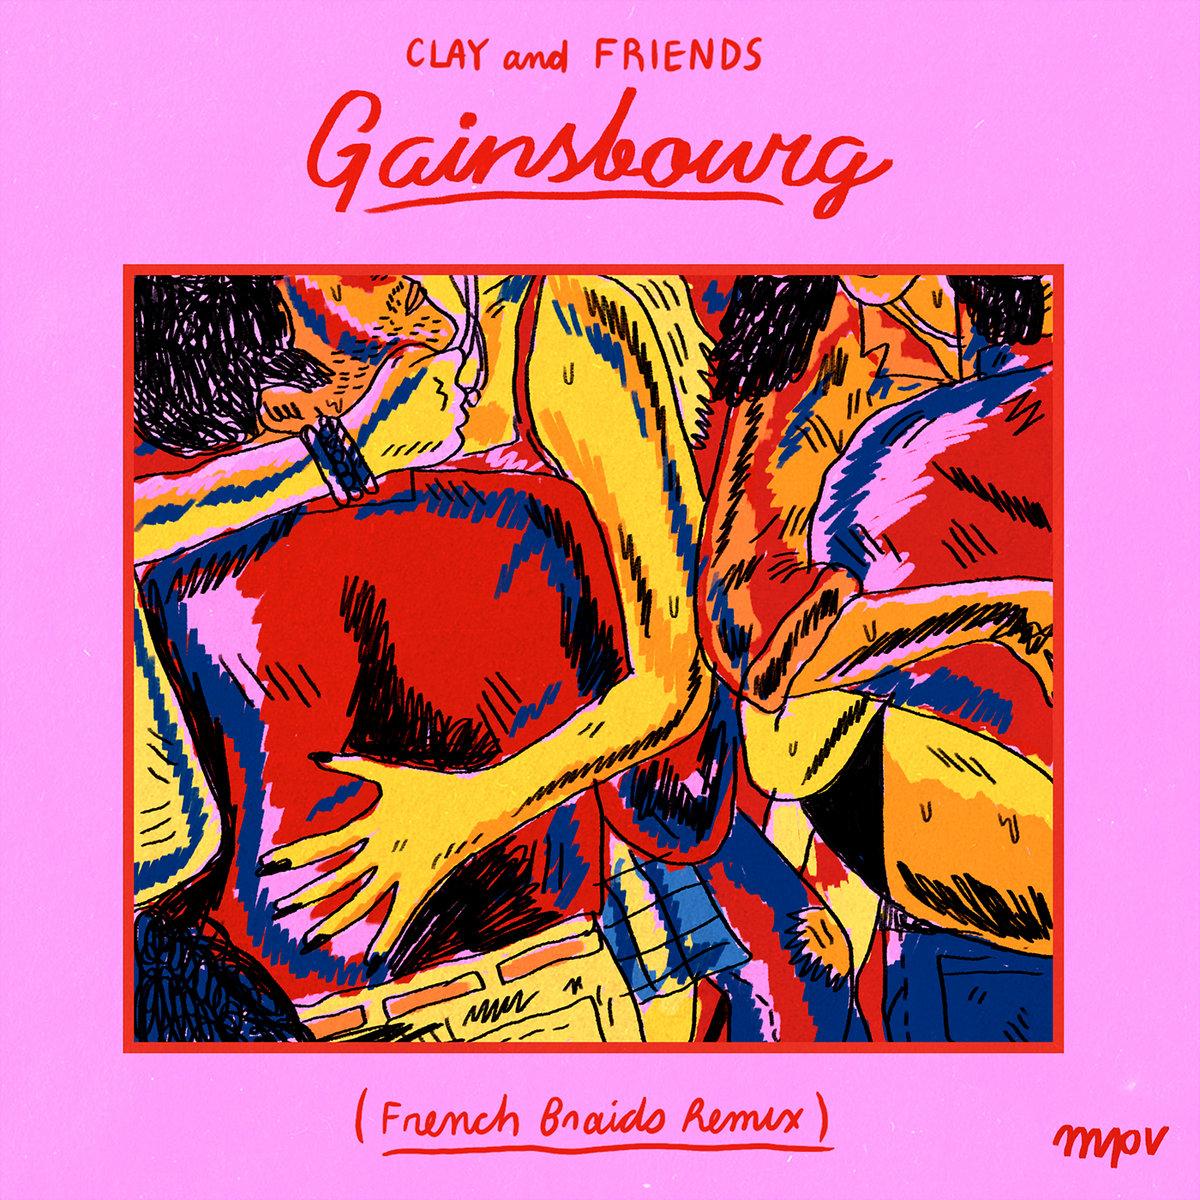 Gainsbourg (French Braids Remix)